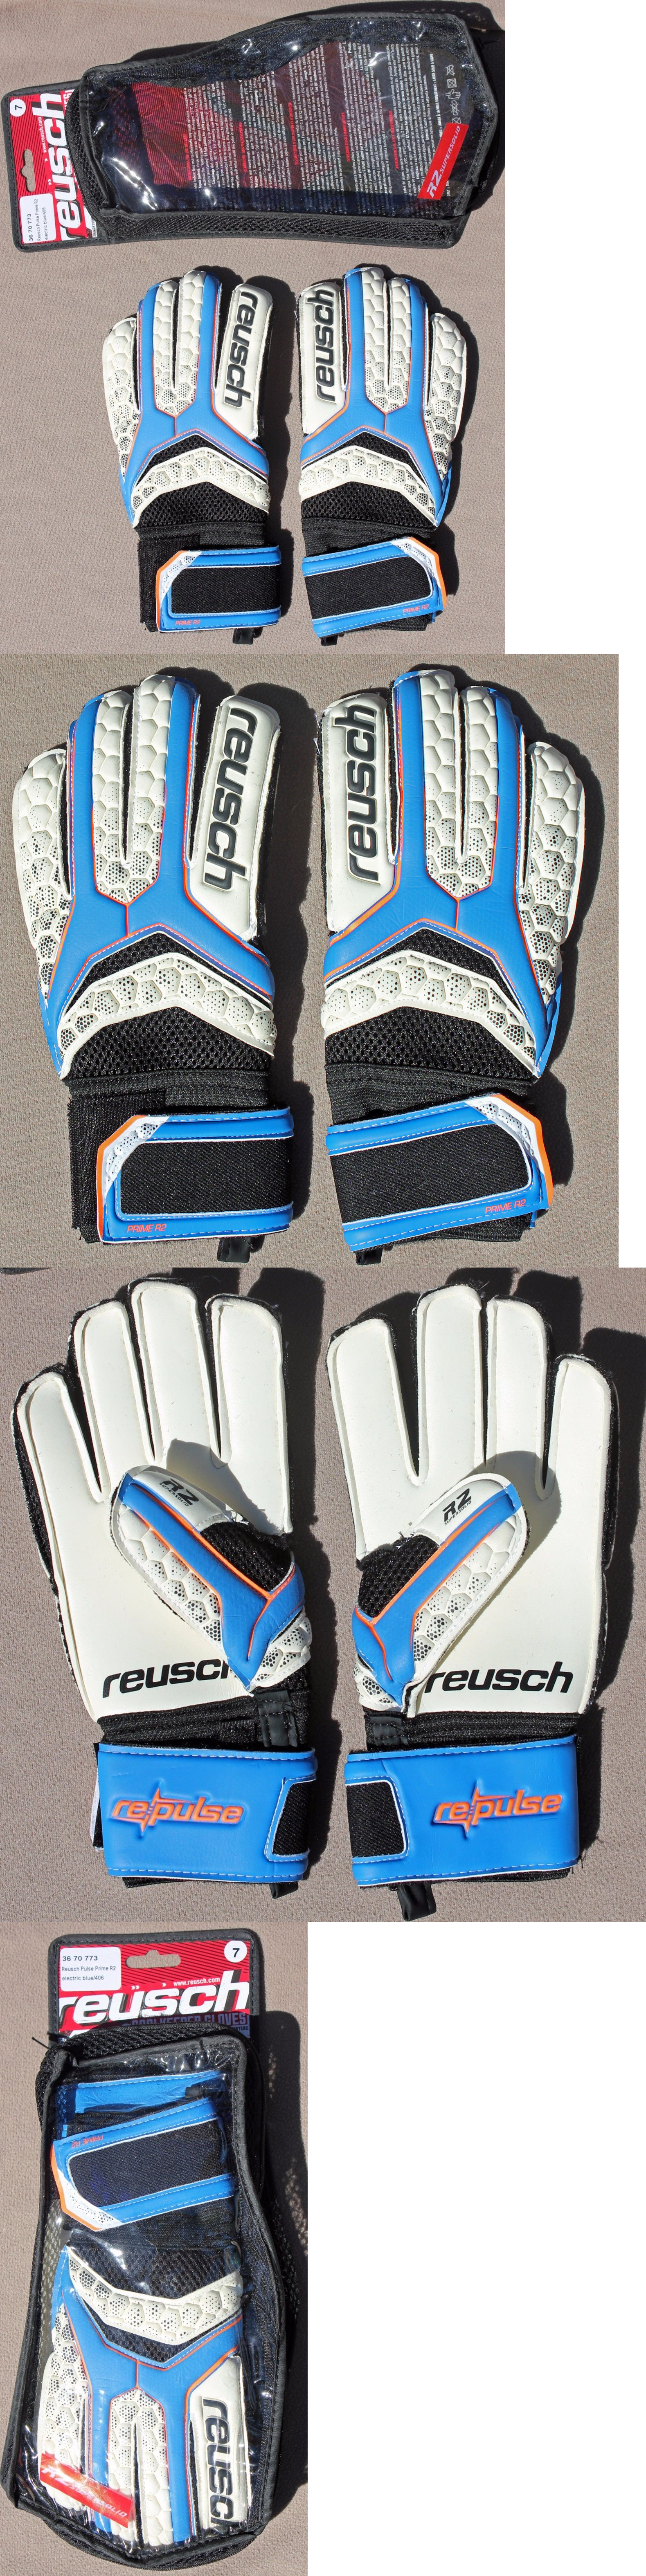 607046a80 New RINAT EGOTIKO 2.0 SPINE GOALIE SOCCER GLOVE Size 8 Futbol Goalkeeper